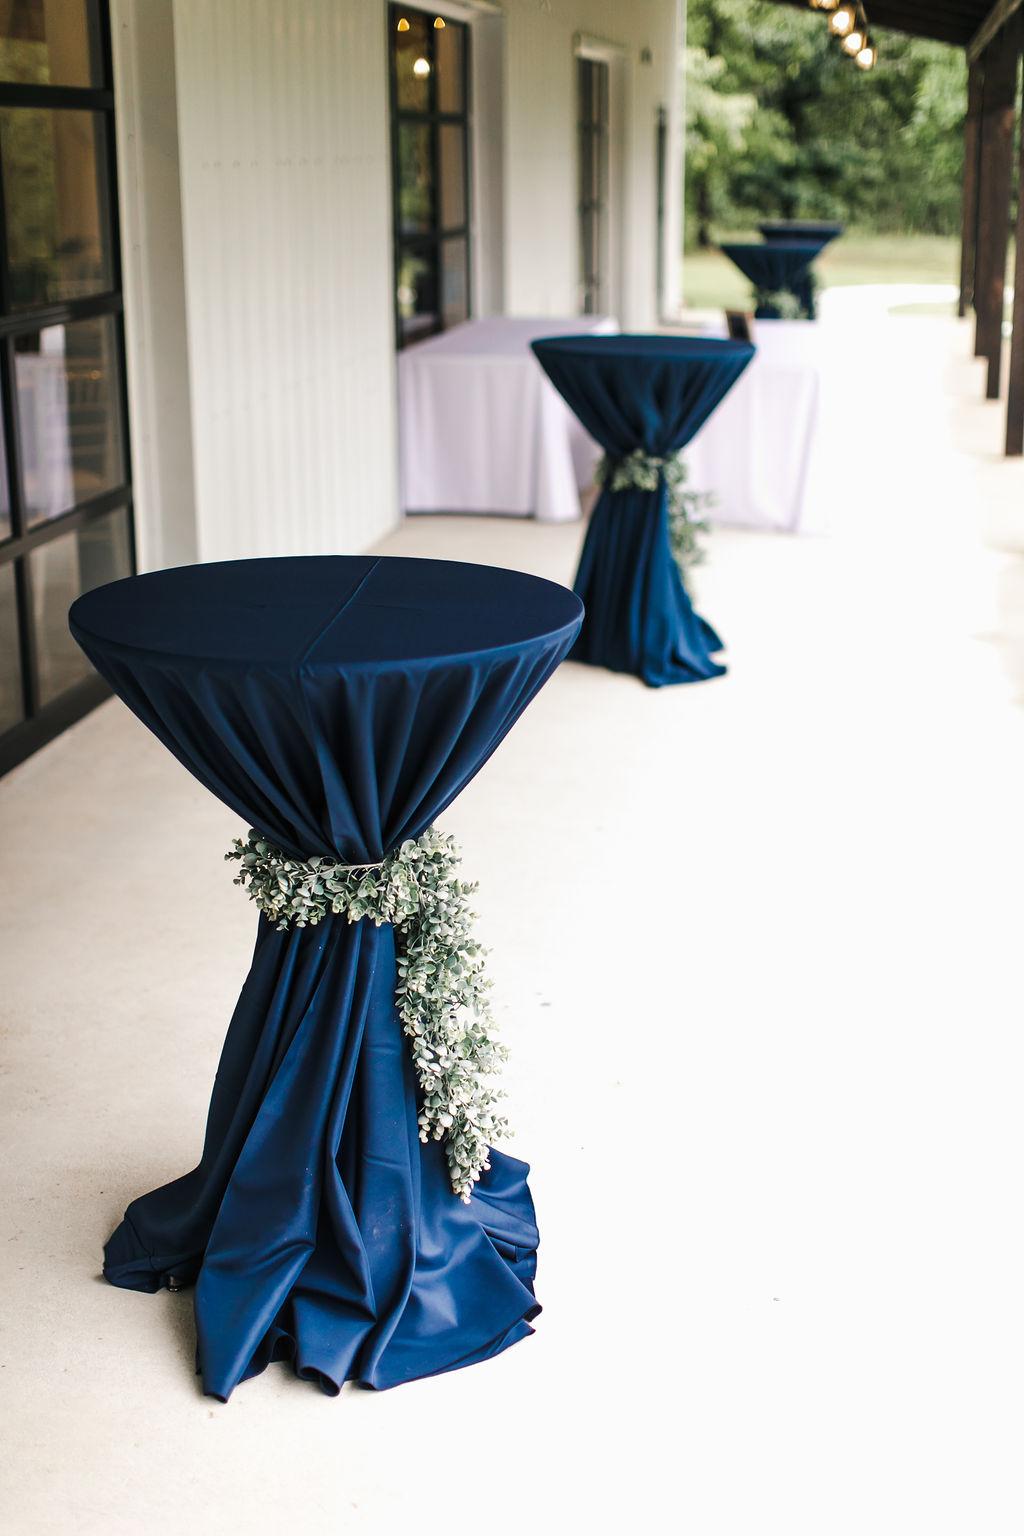 Dream Point Ranch Tulsa's White Barn Wedding Venue 5.jpg